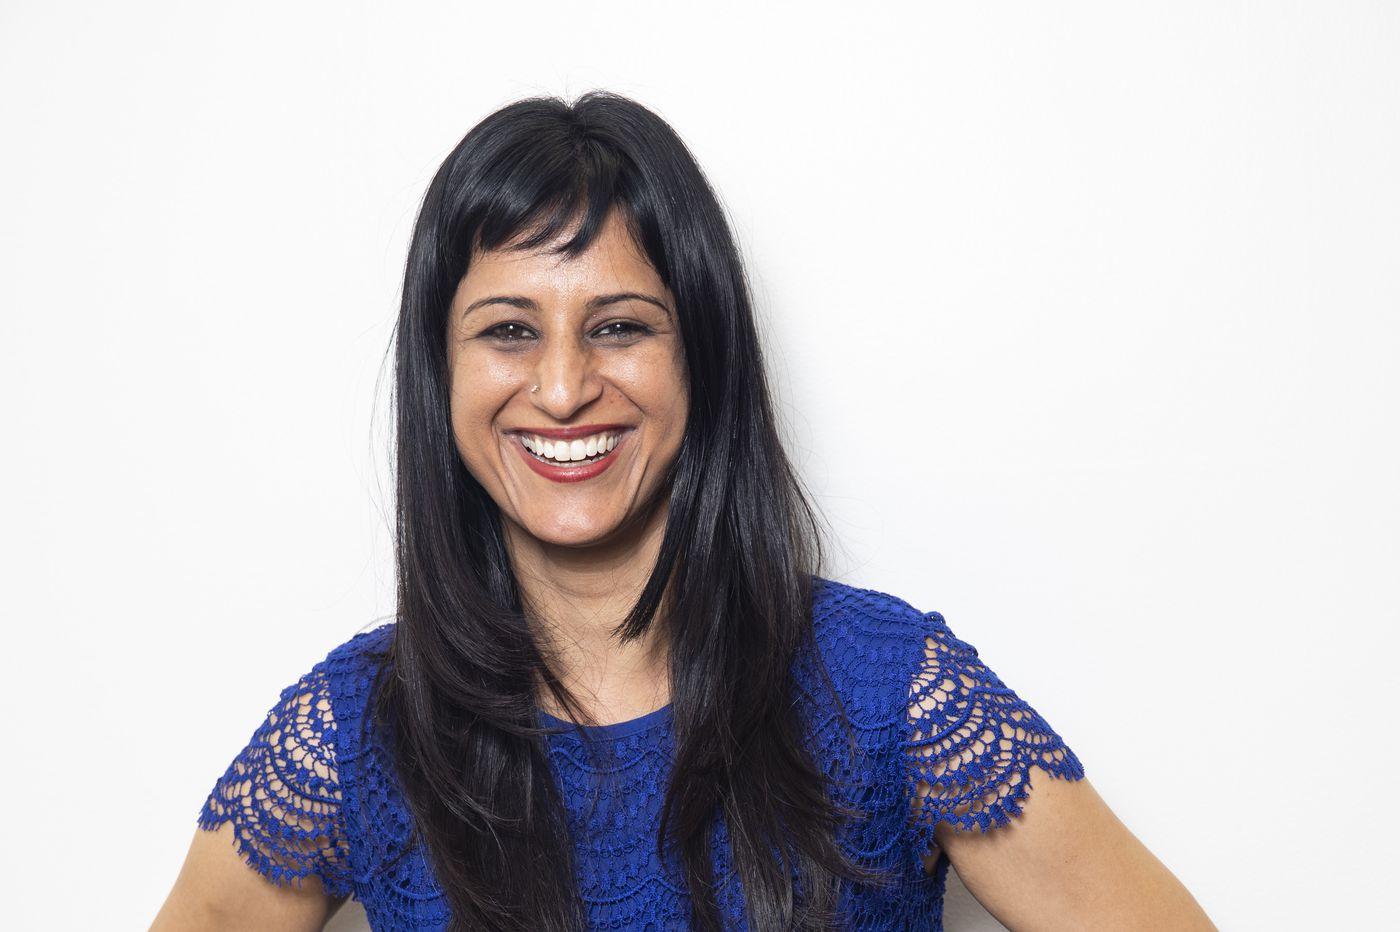 Video: Sunita Puri, author of 'That Good Night,' on telling her health story